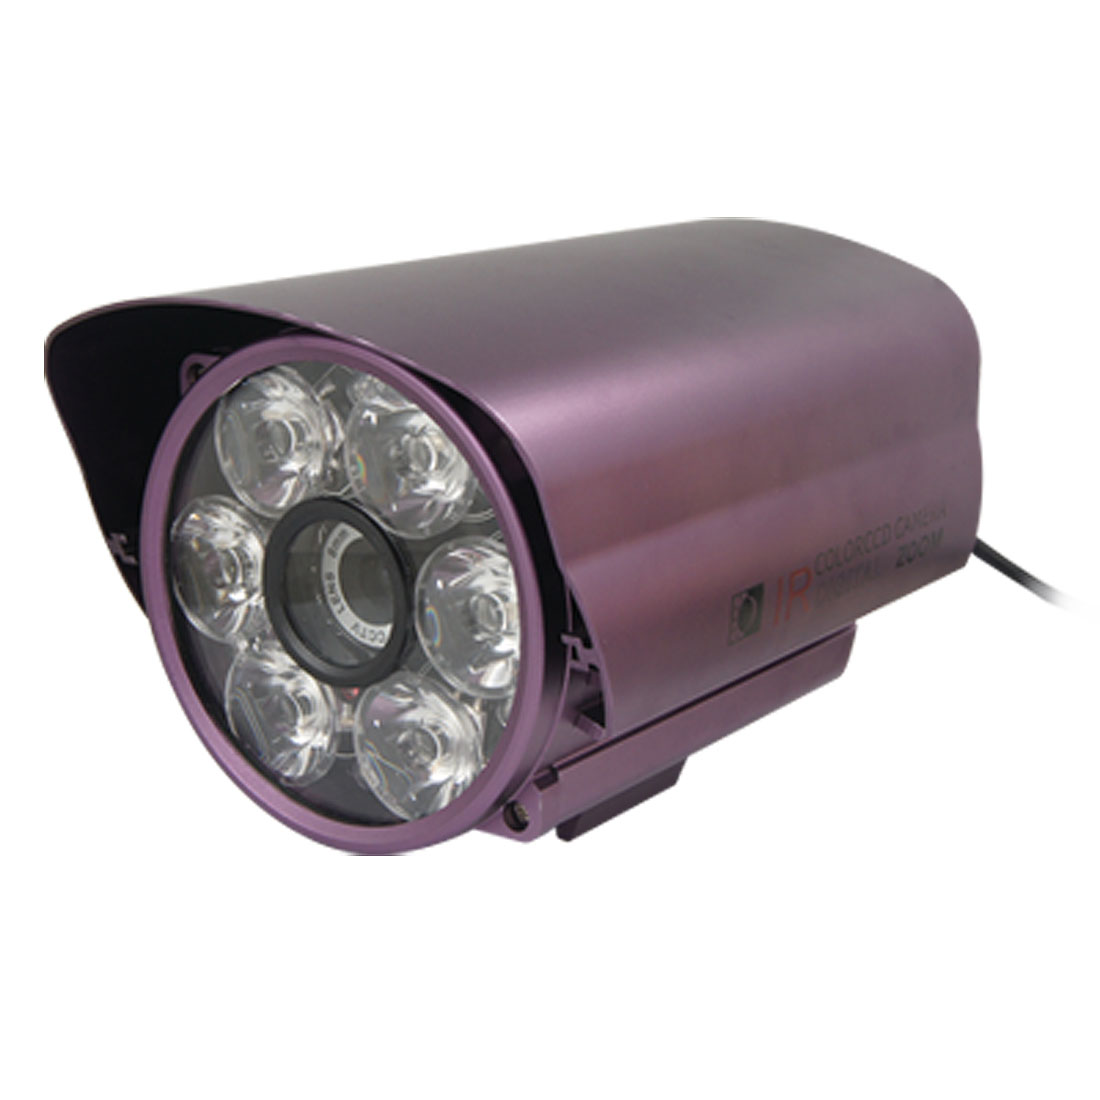 "Purple Shell 1/3"" Auto IR Color CCD 8mm Lens CCTV Security Camera"